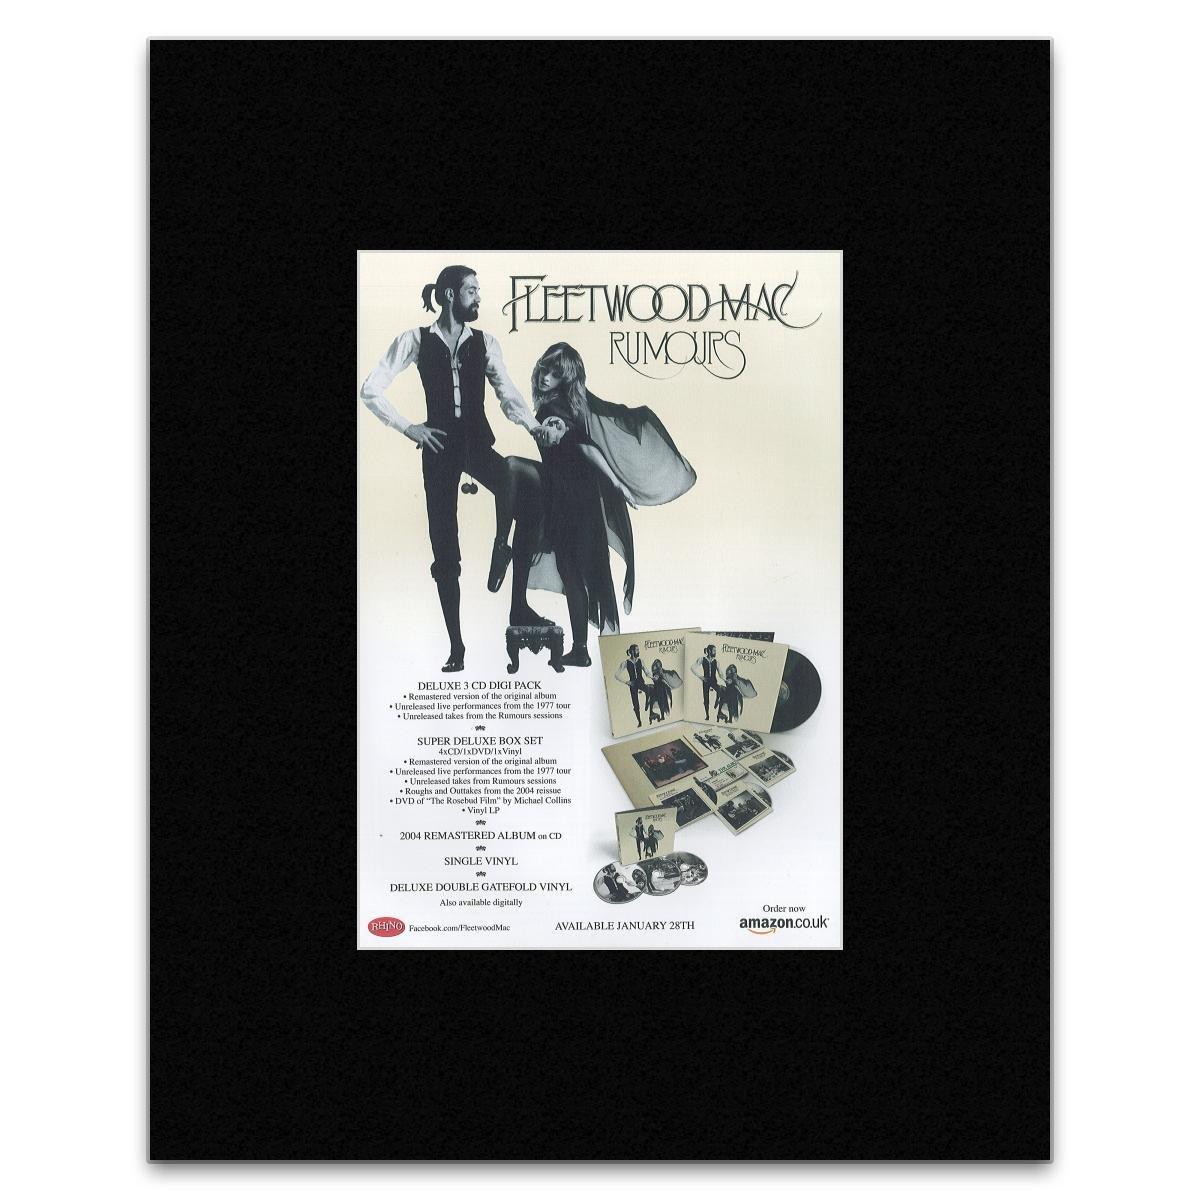 Amazon.com: Uncut FLEETWOOD MAC - Rumours Mini Poster - 28.5x21cm ...